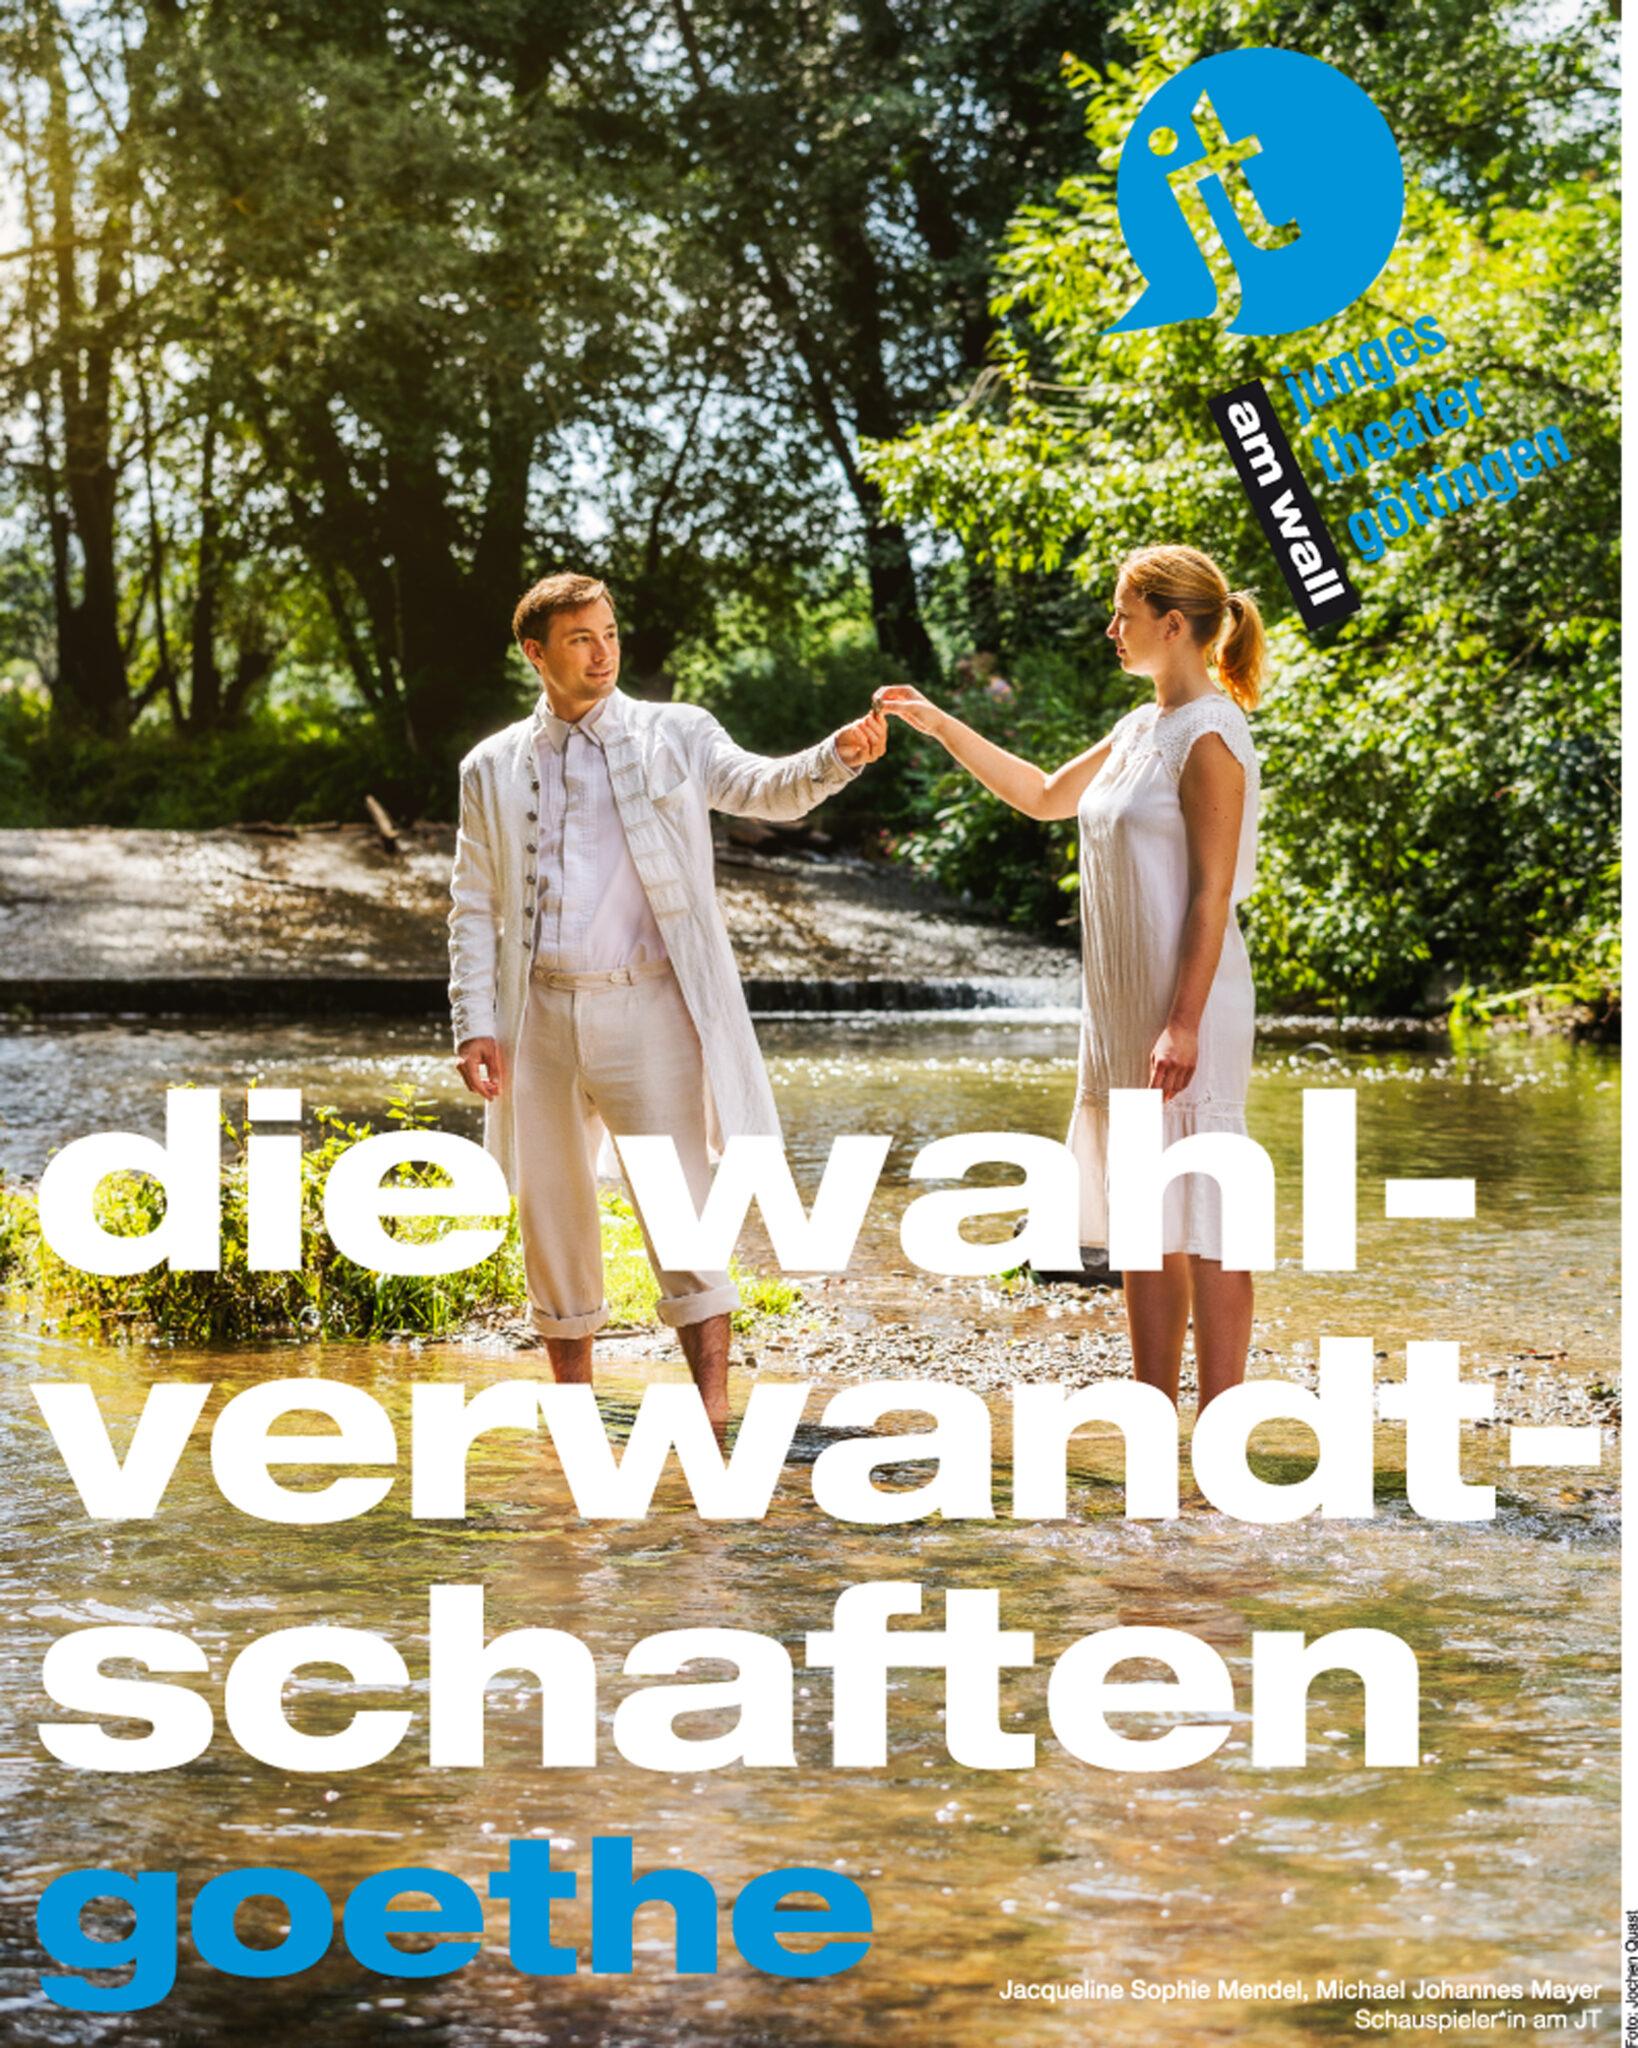 https://www.junges-theater.de/wp-content/uploads/2020/07/Plakat_DieWahlverwandschaften-scaled.jpg